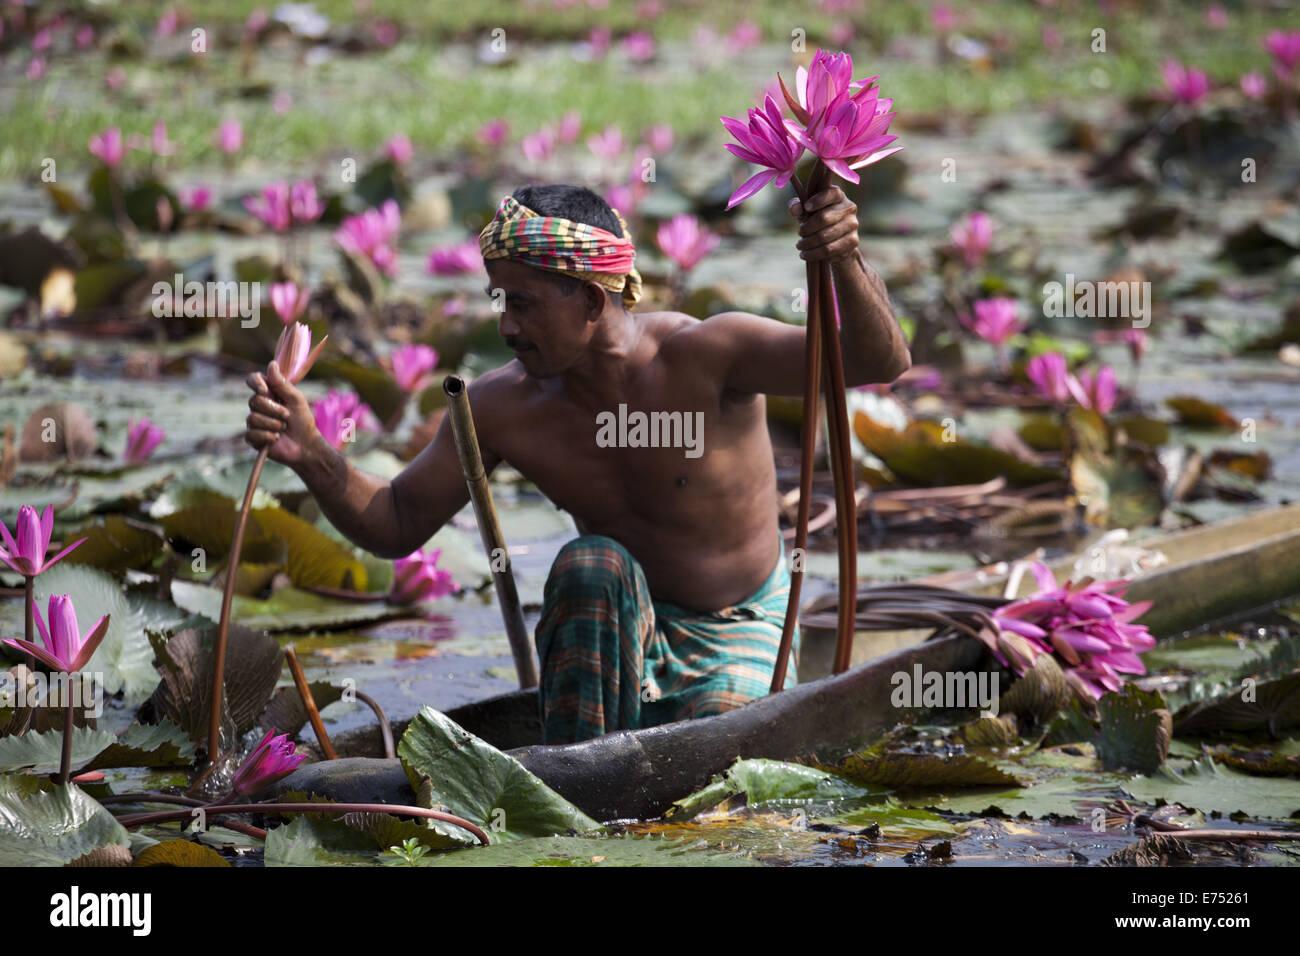 Dhaka bangladesh 7th sep 2013 water lily the national flower of 7th sep 2013 water lily the national flower of bangladeshduring the rainy season in banglaadesh water lilies bloom in wetlands izmirmasajfo